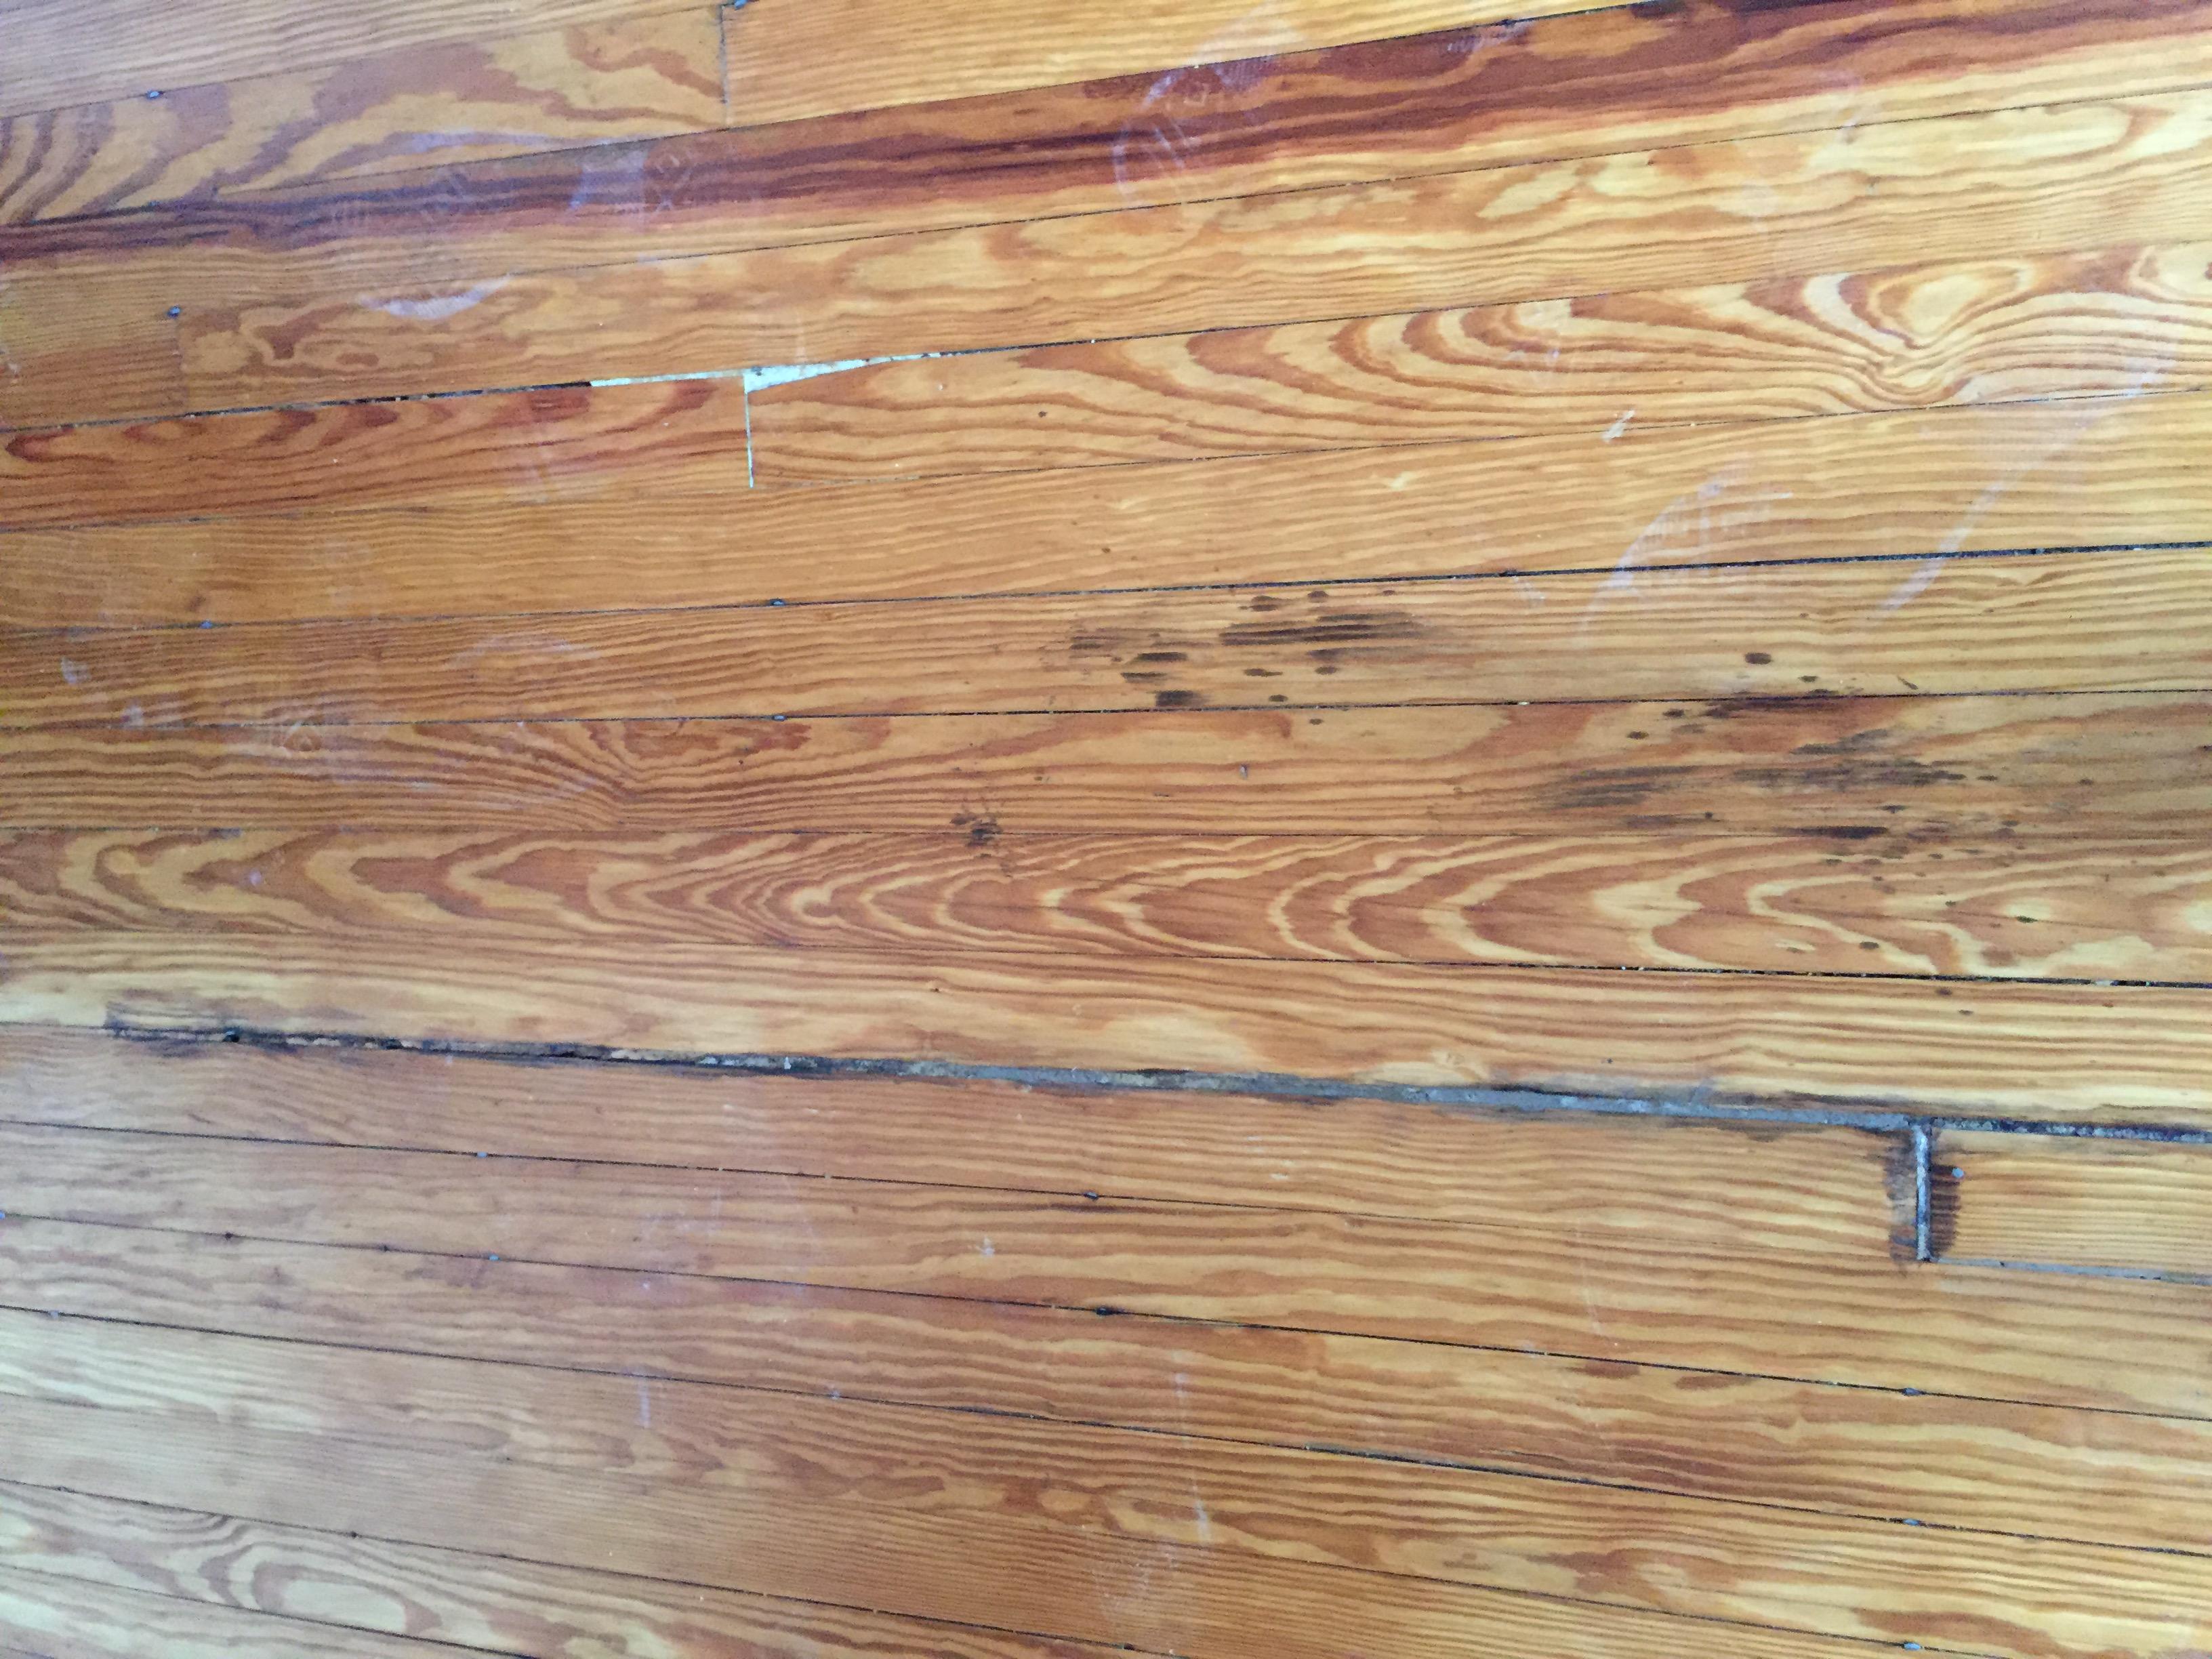 Repairing wood floors fix scratched wood floor images for Hardwood floor repair